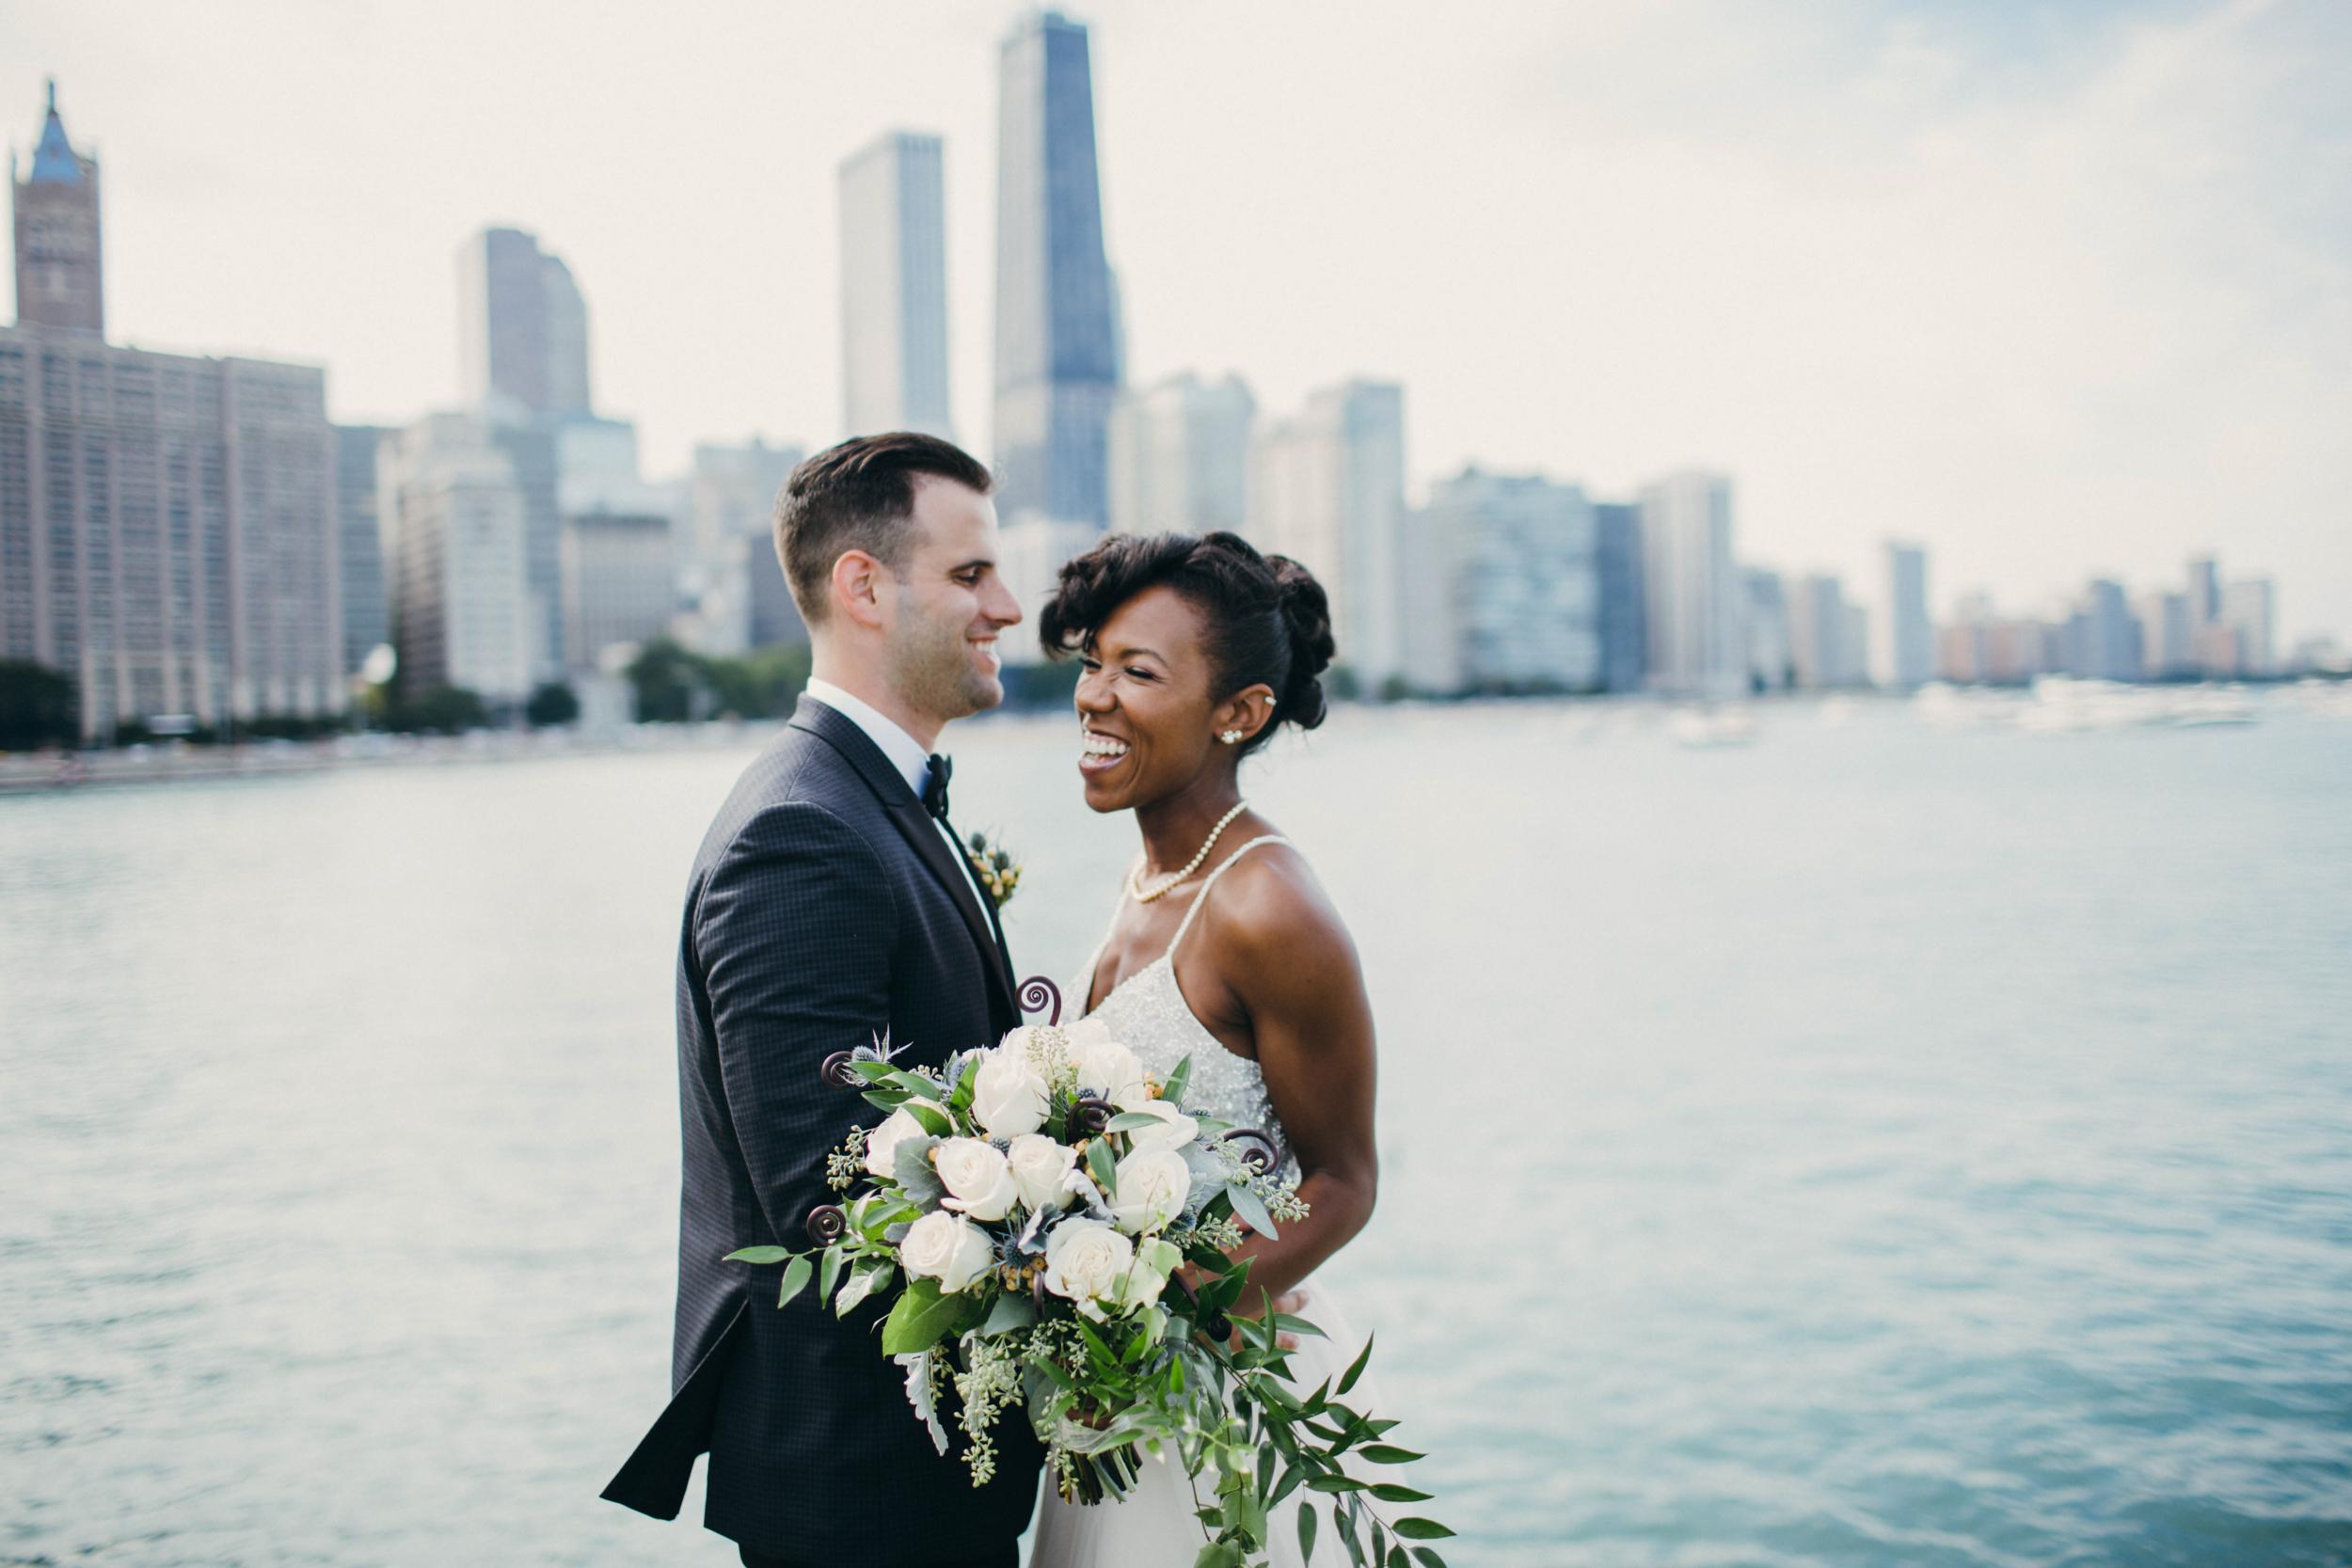 chicago.wedding.urban.intimate.zed451.lake.milton olive park-86.jpg